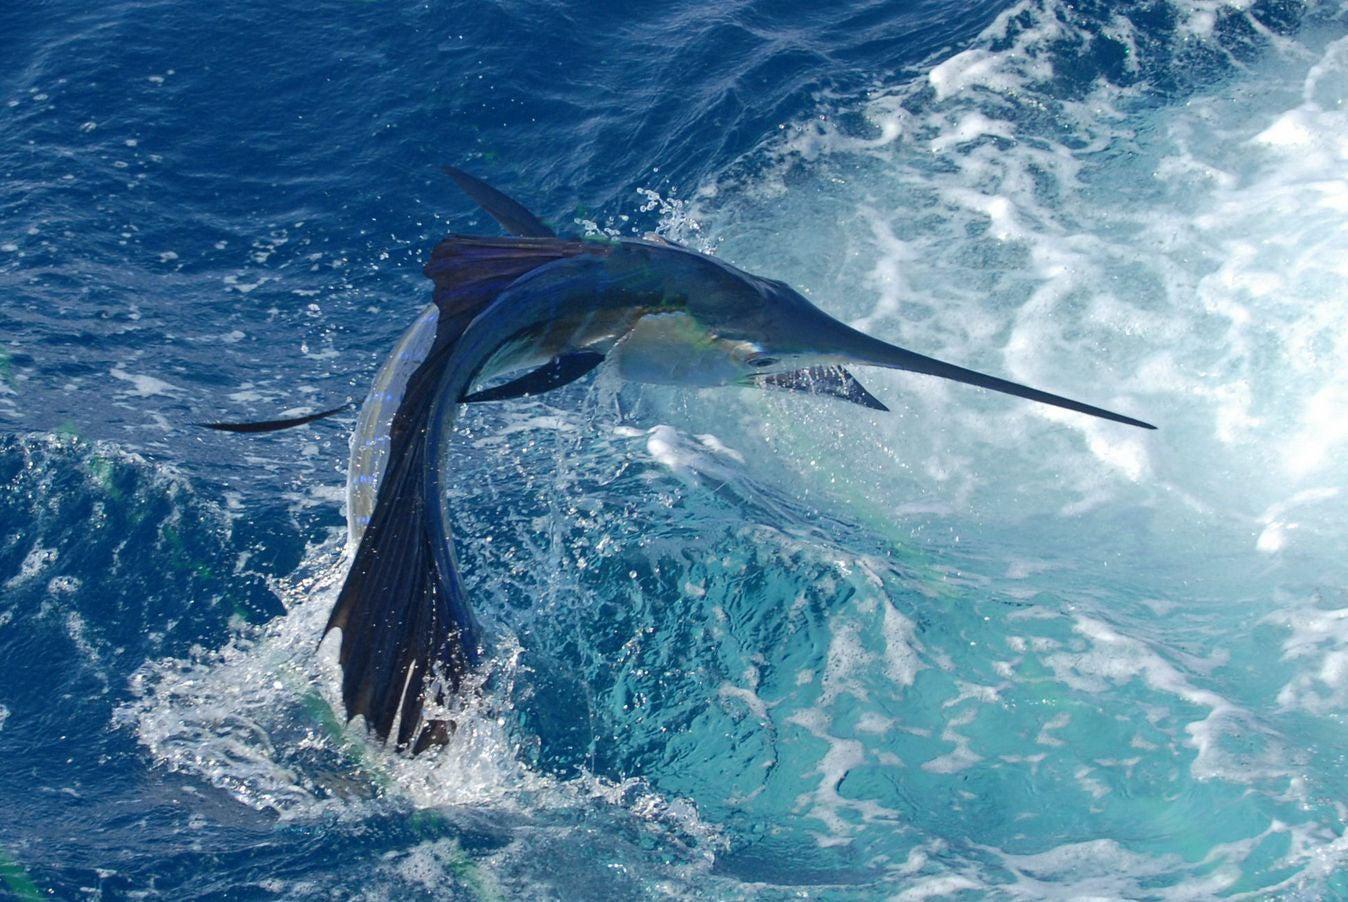 Sailfish in the ocean